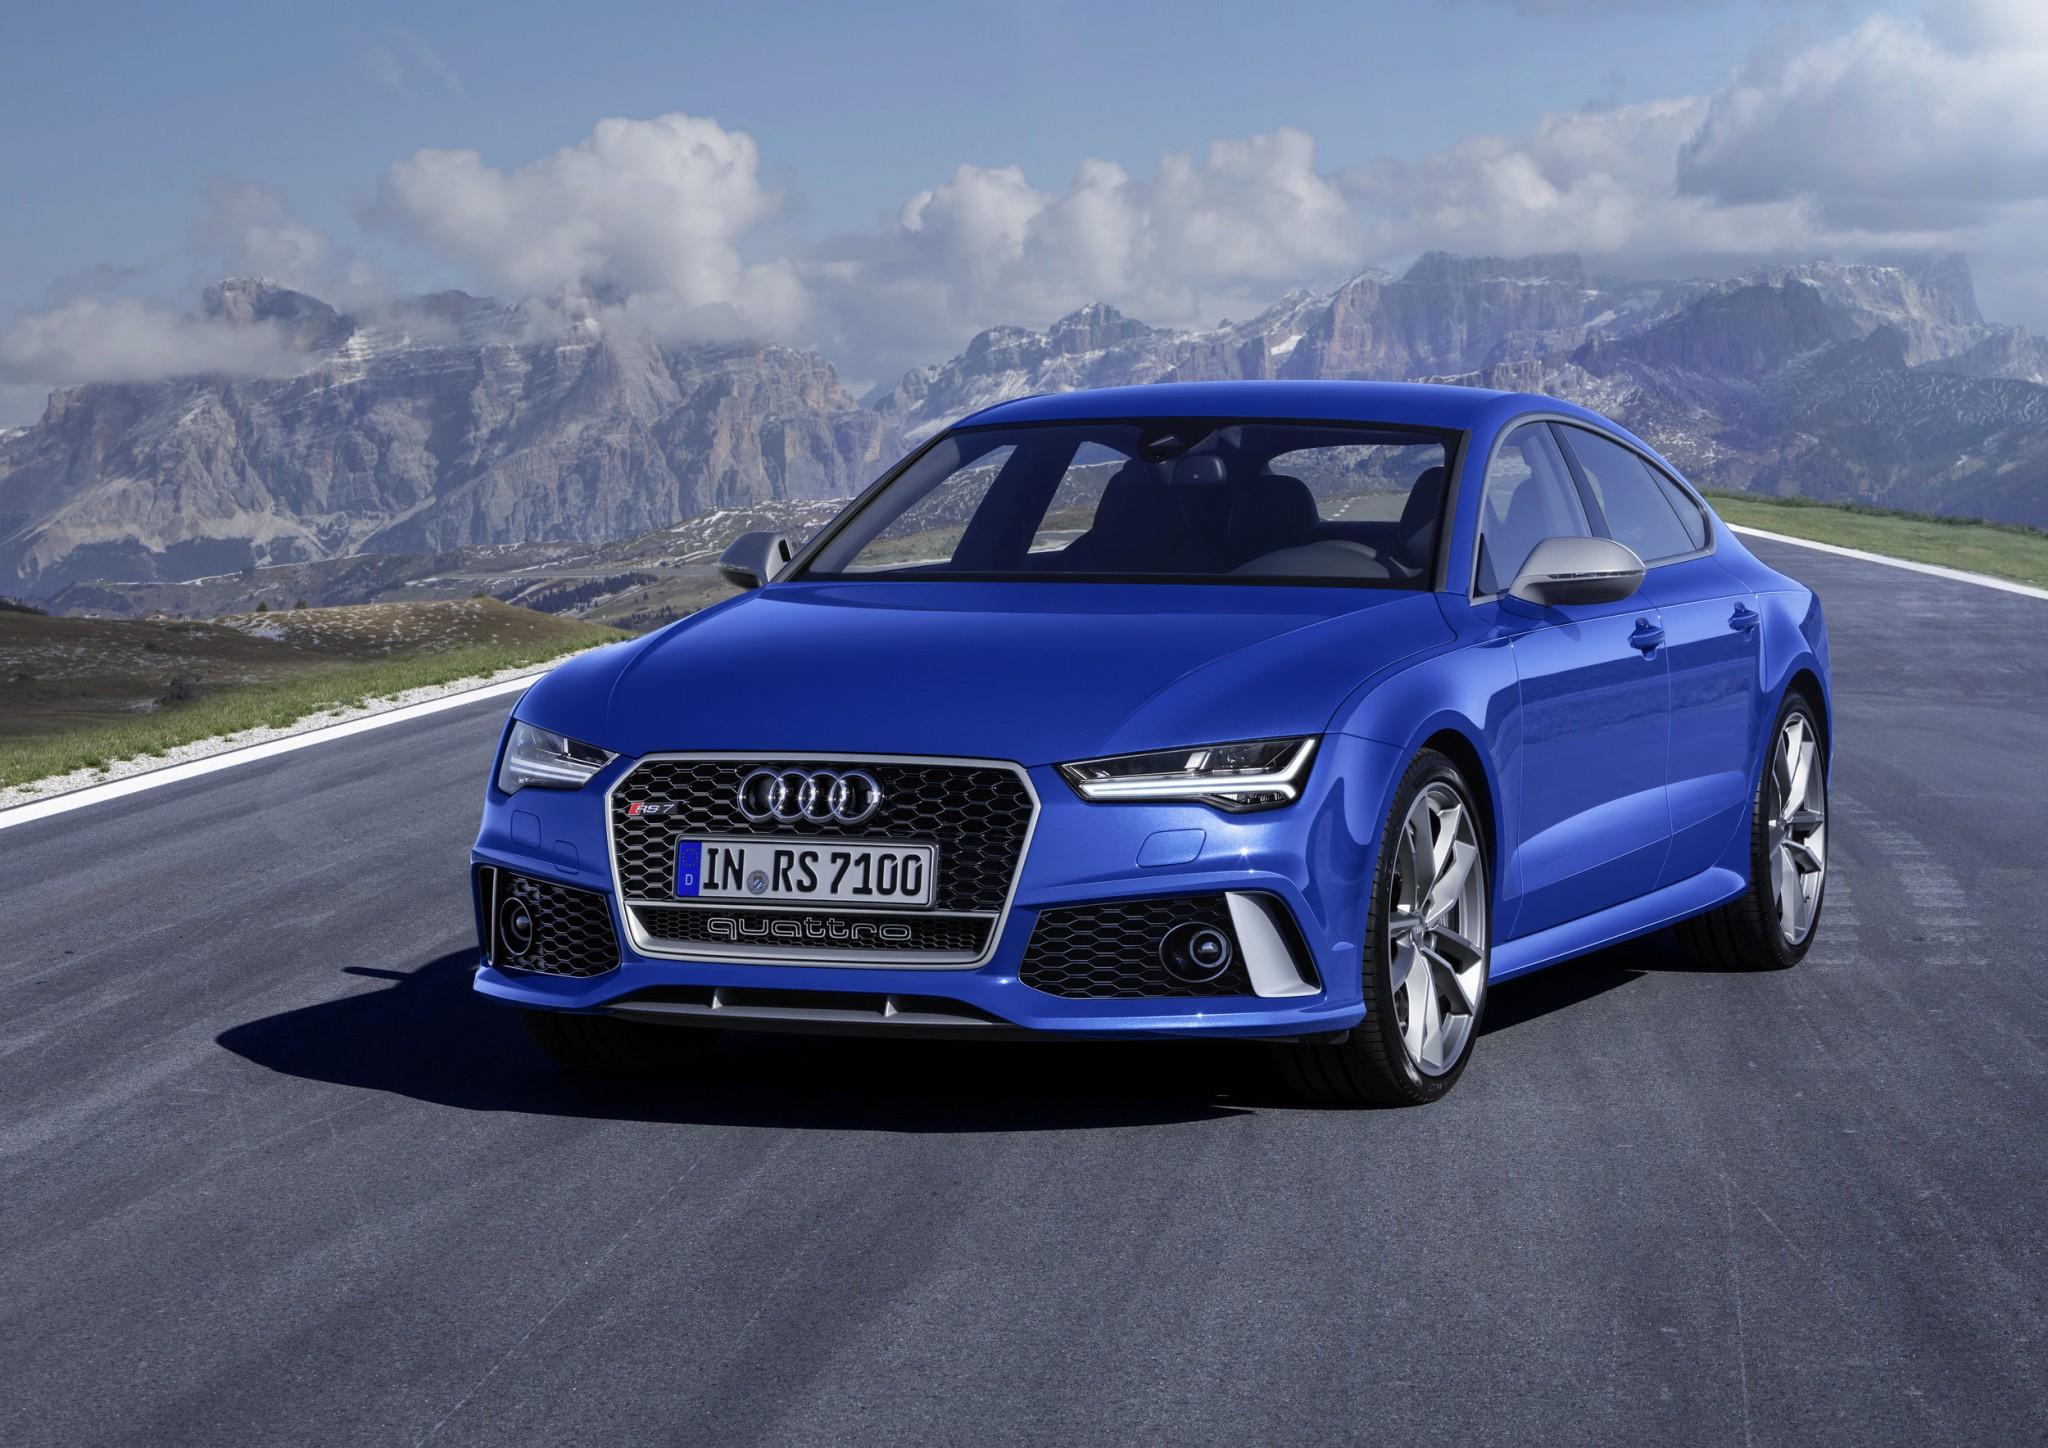 2015 Audi RS7 Performance